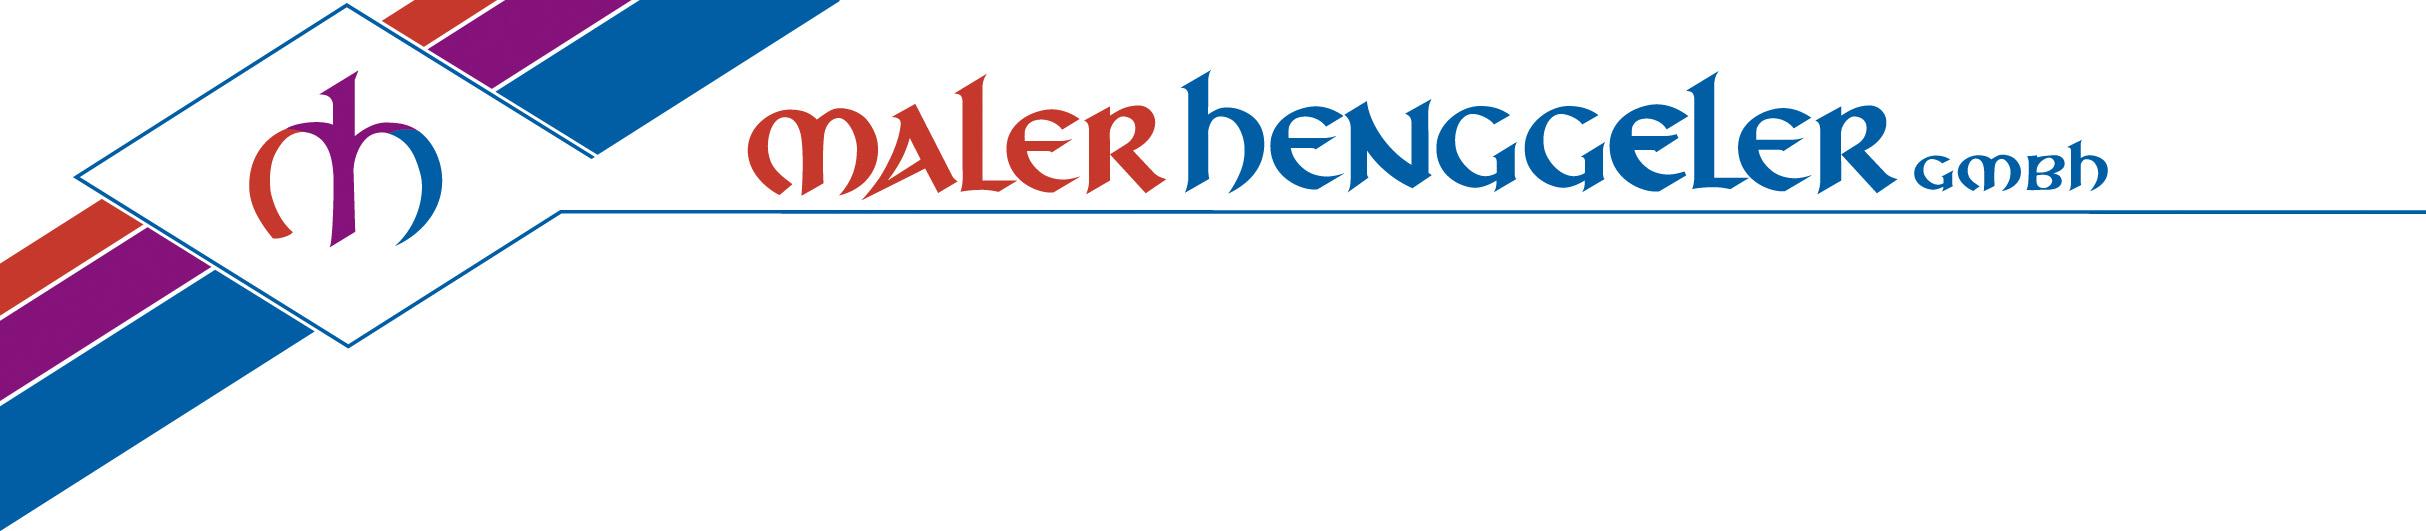 henggeler_Logo